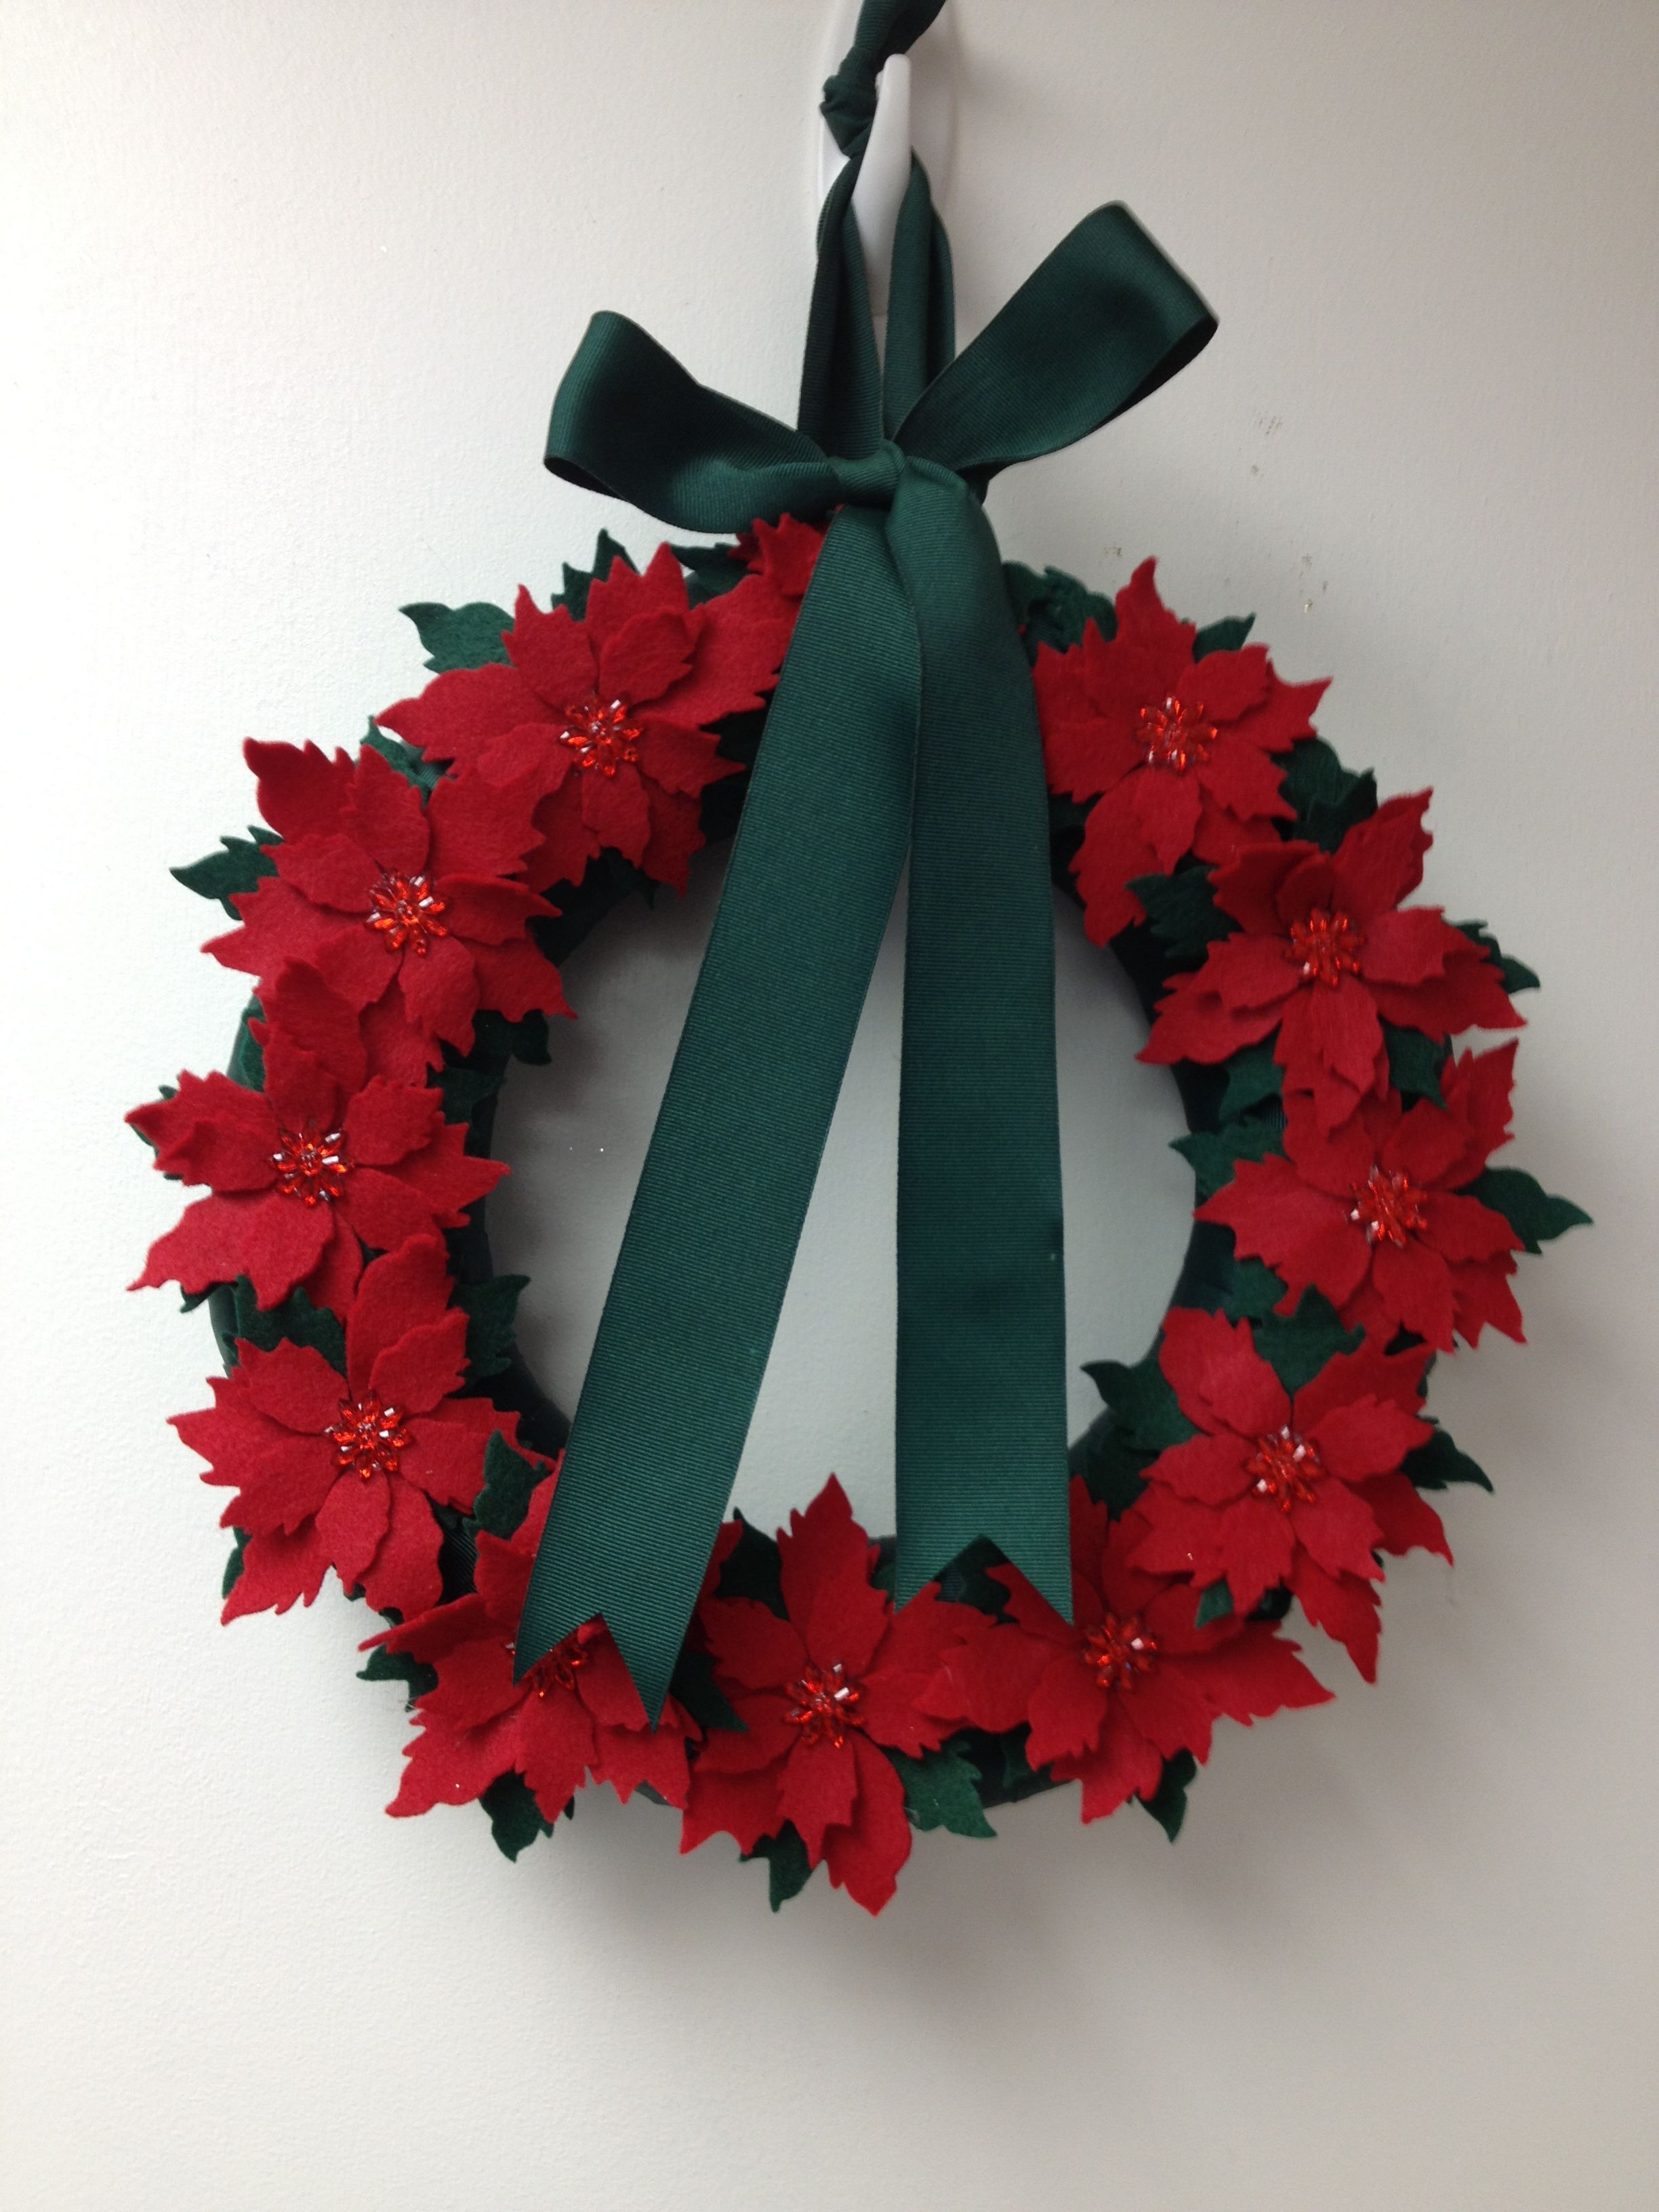 Wreath wreaths poinsettia poinsettias felt red green buttons bows ribbon merry christmas. Holiday holidays ribbon pairofpetals.com